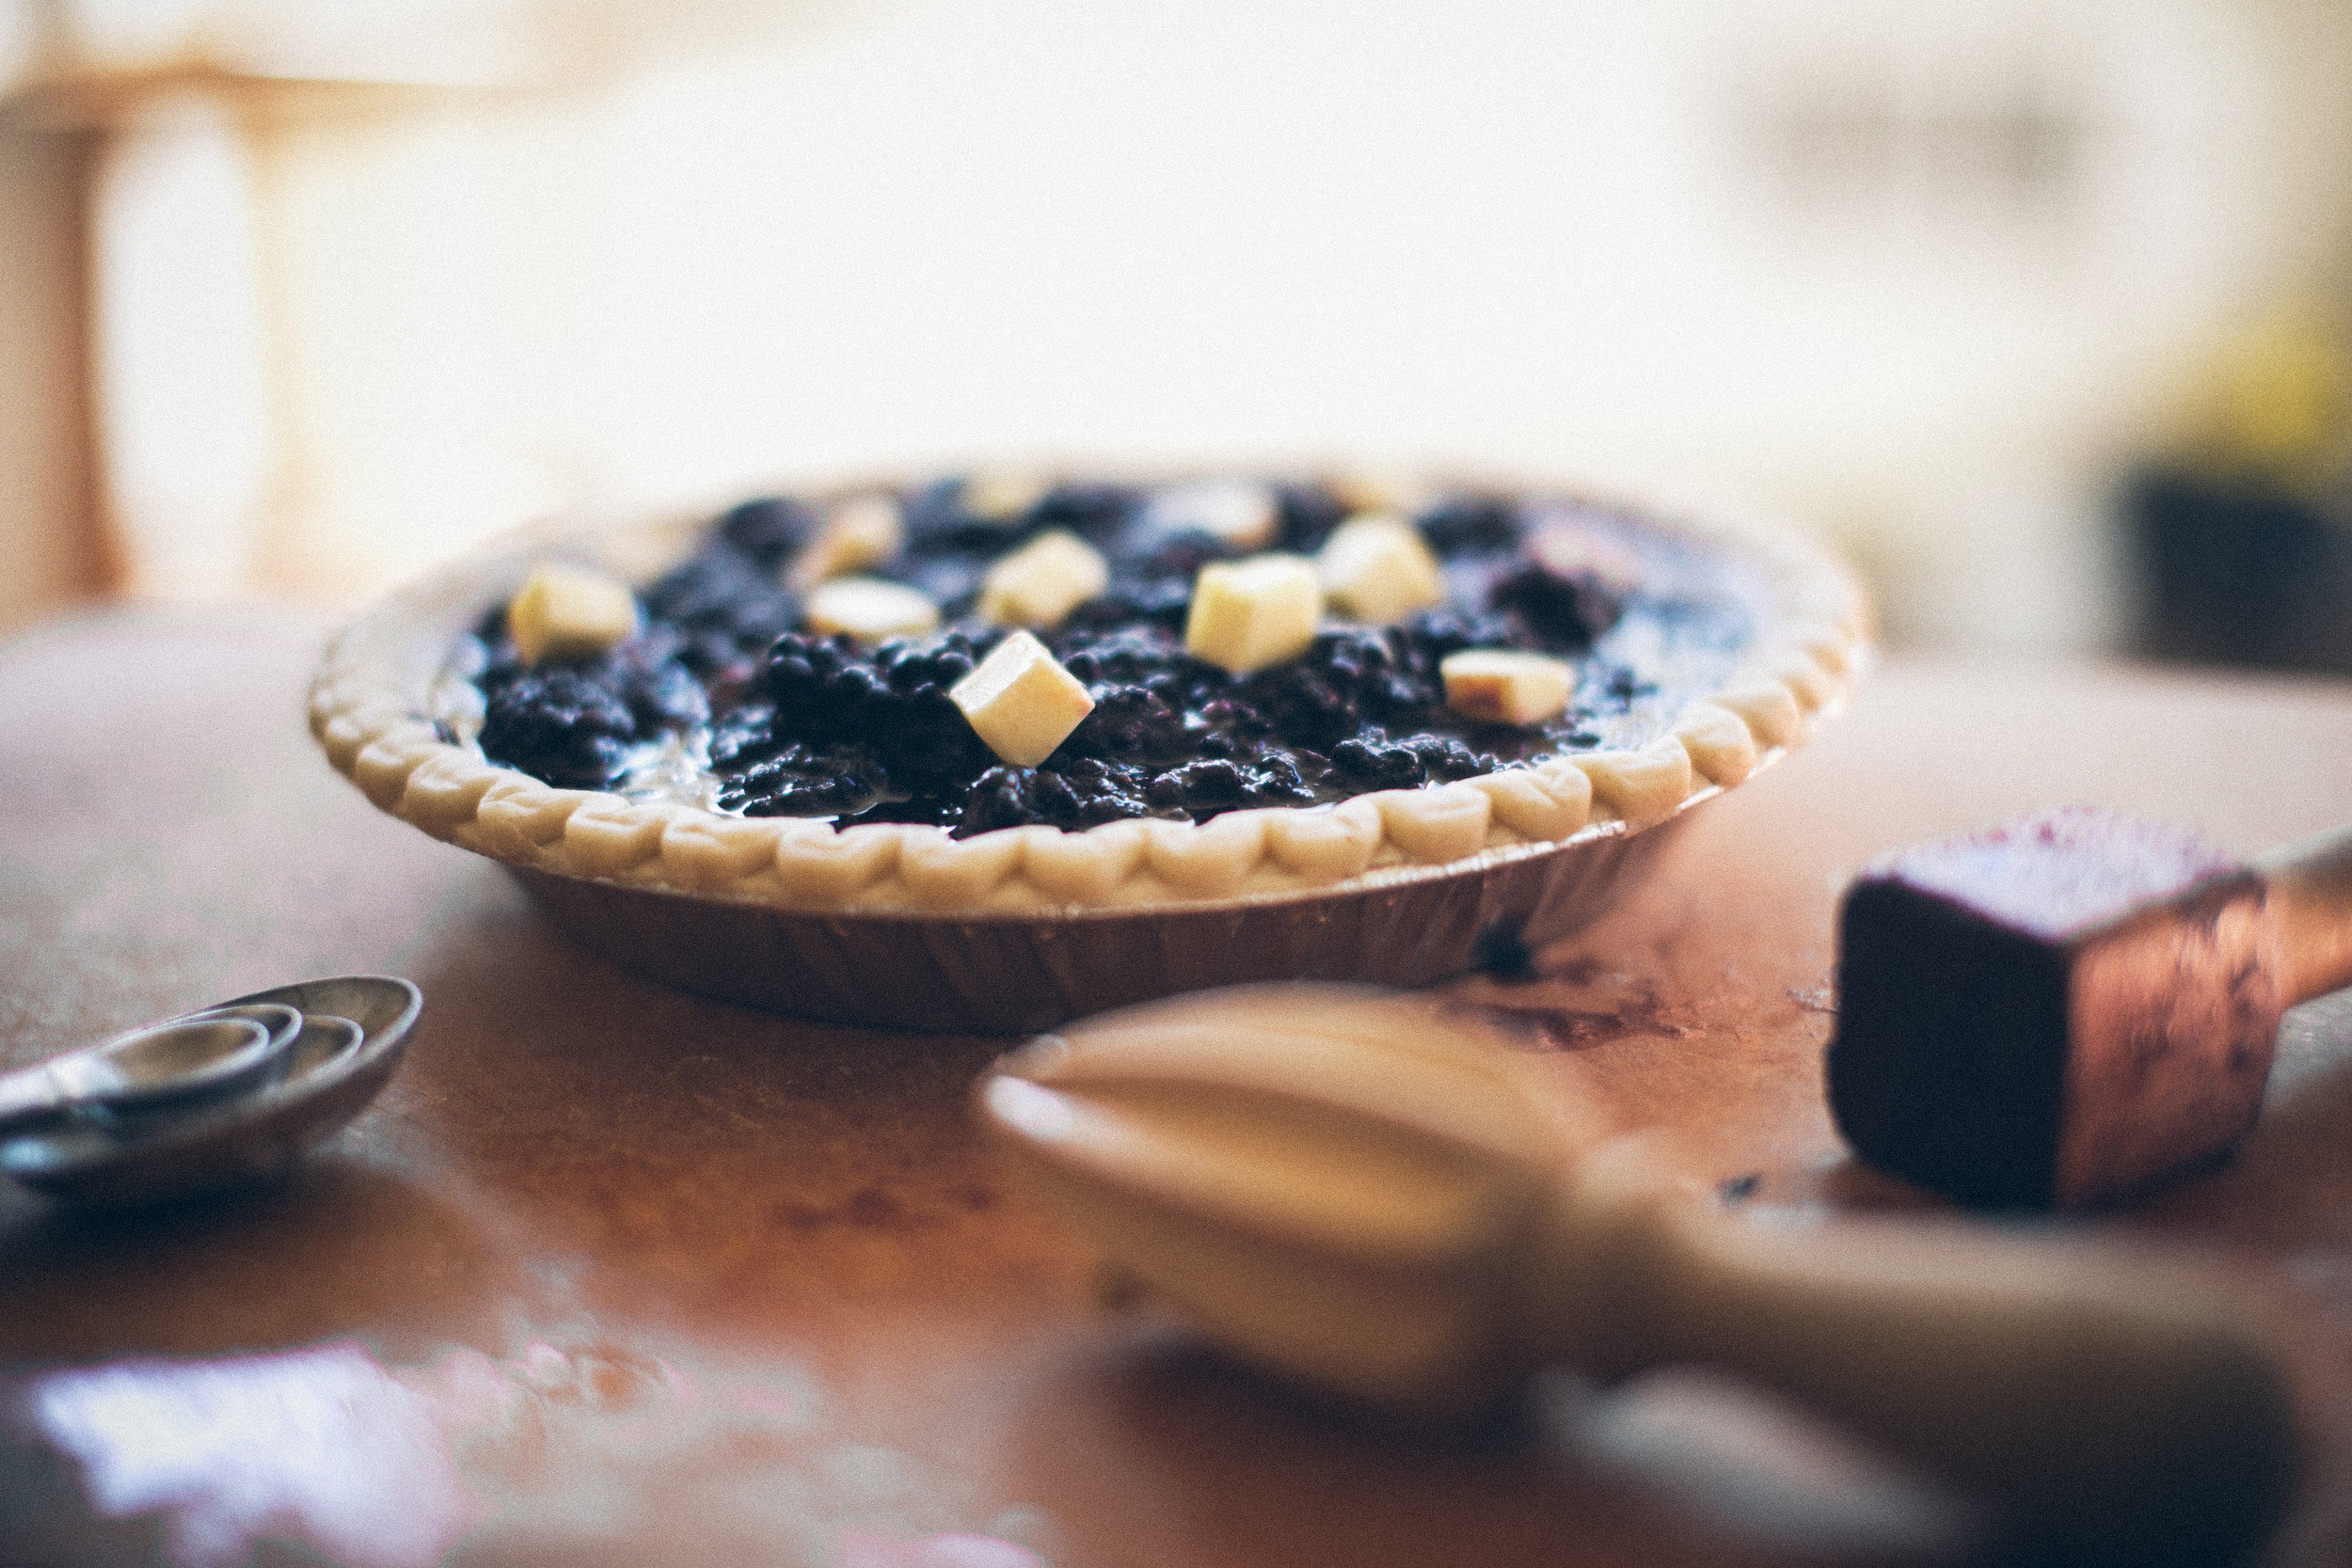 Black-berry-pie-9930.jpg